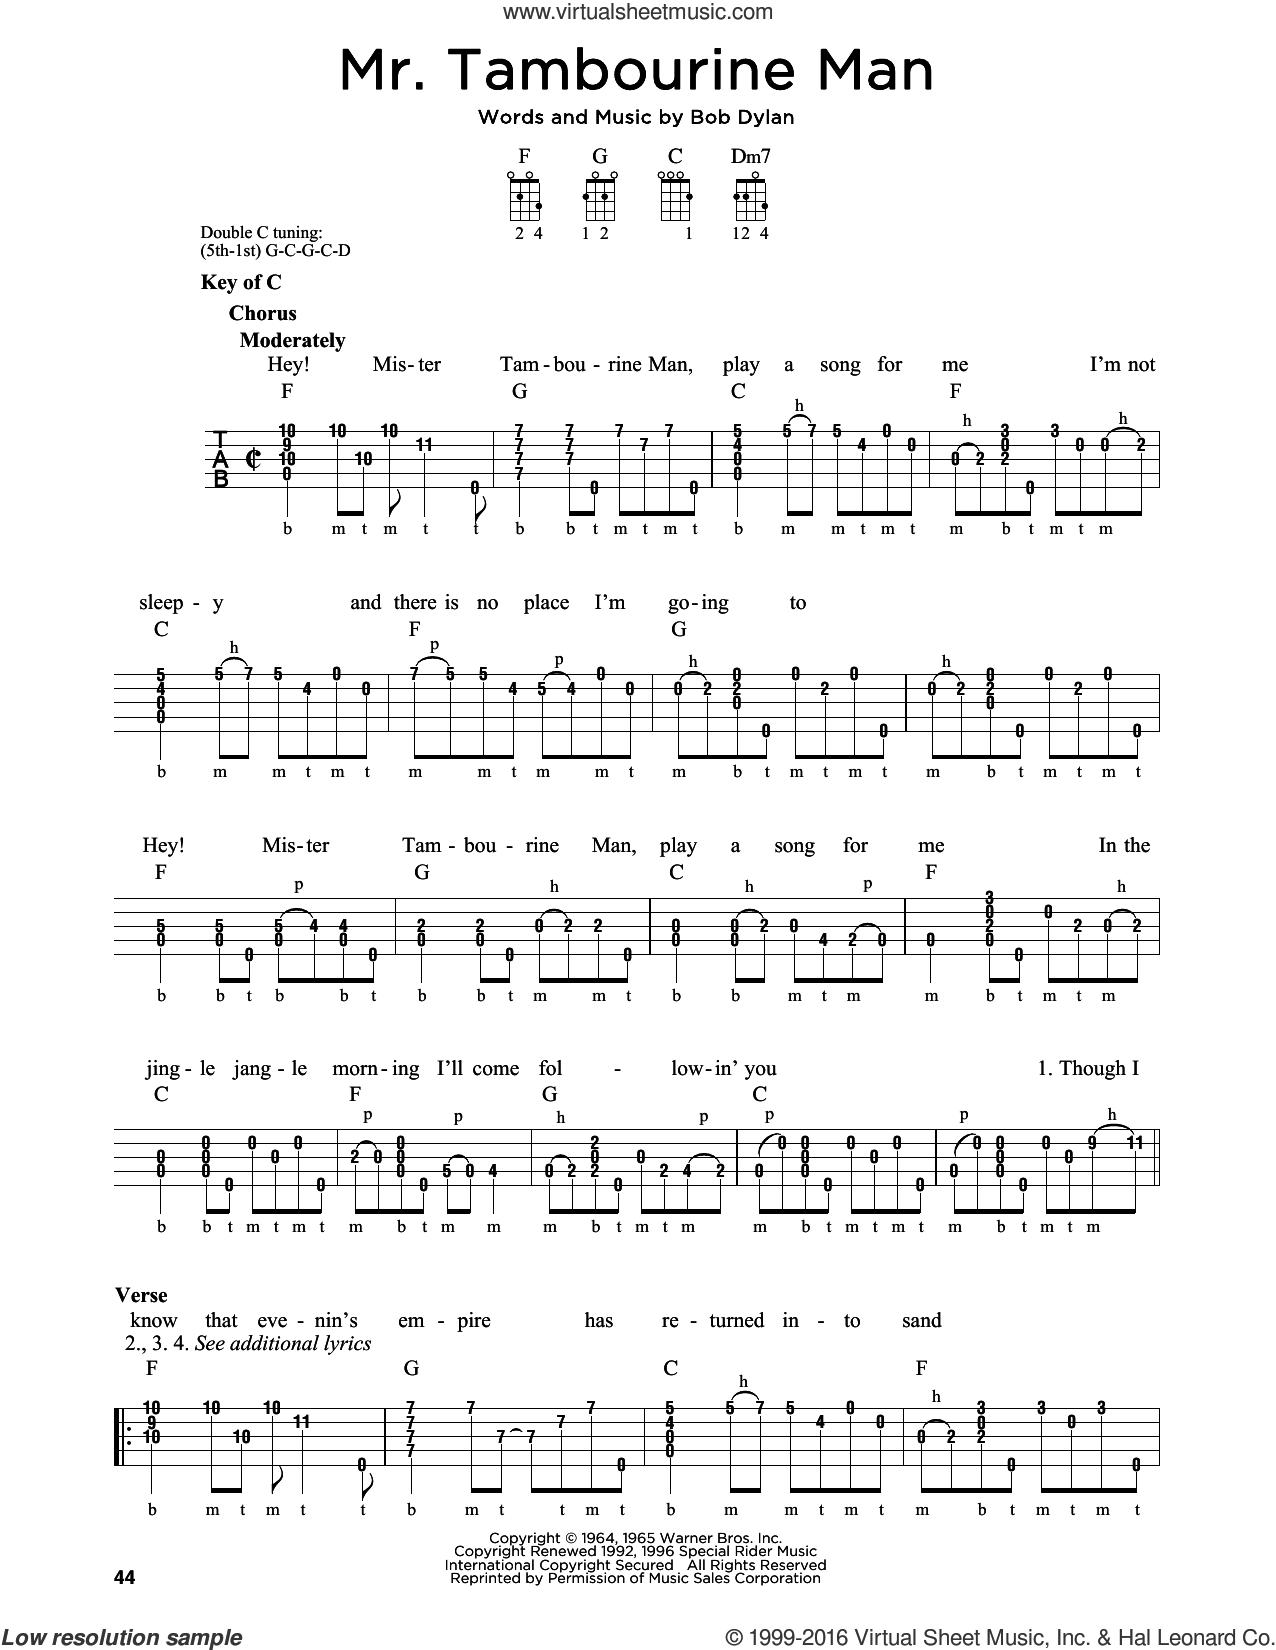 Mr. Tambourine Man sheet music for banjo solo by Bob Dylan, intermediate skill level